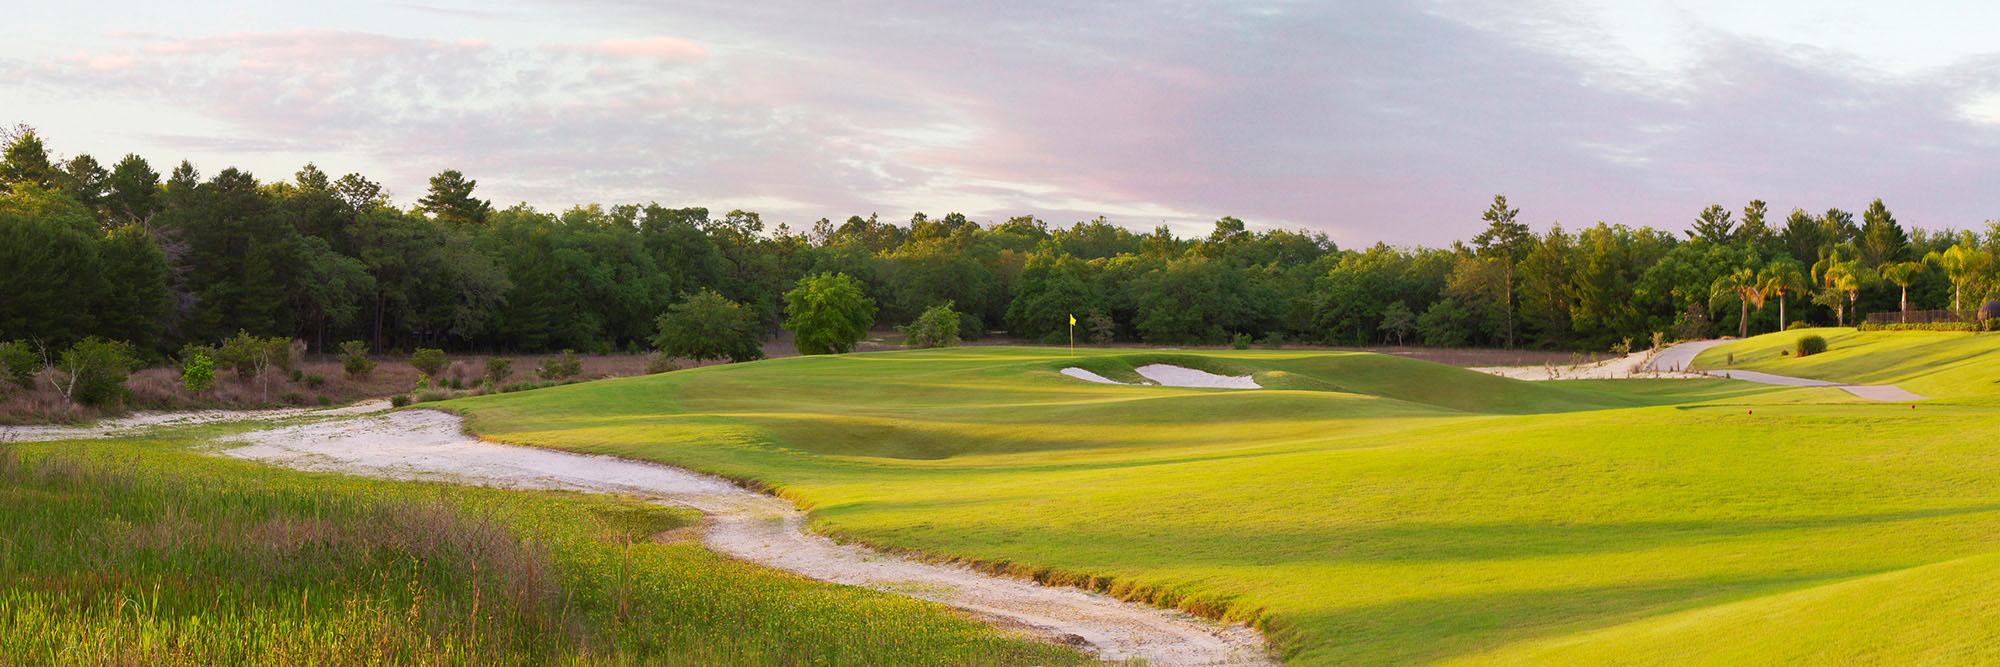 Golf Course Image - Reunion Resort Nicklaus No. 8